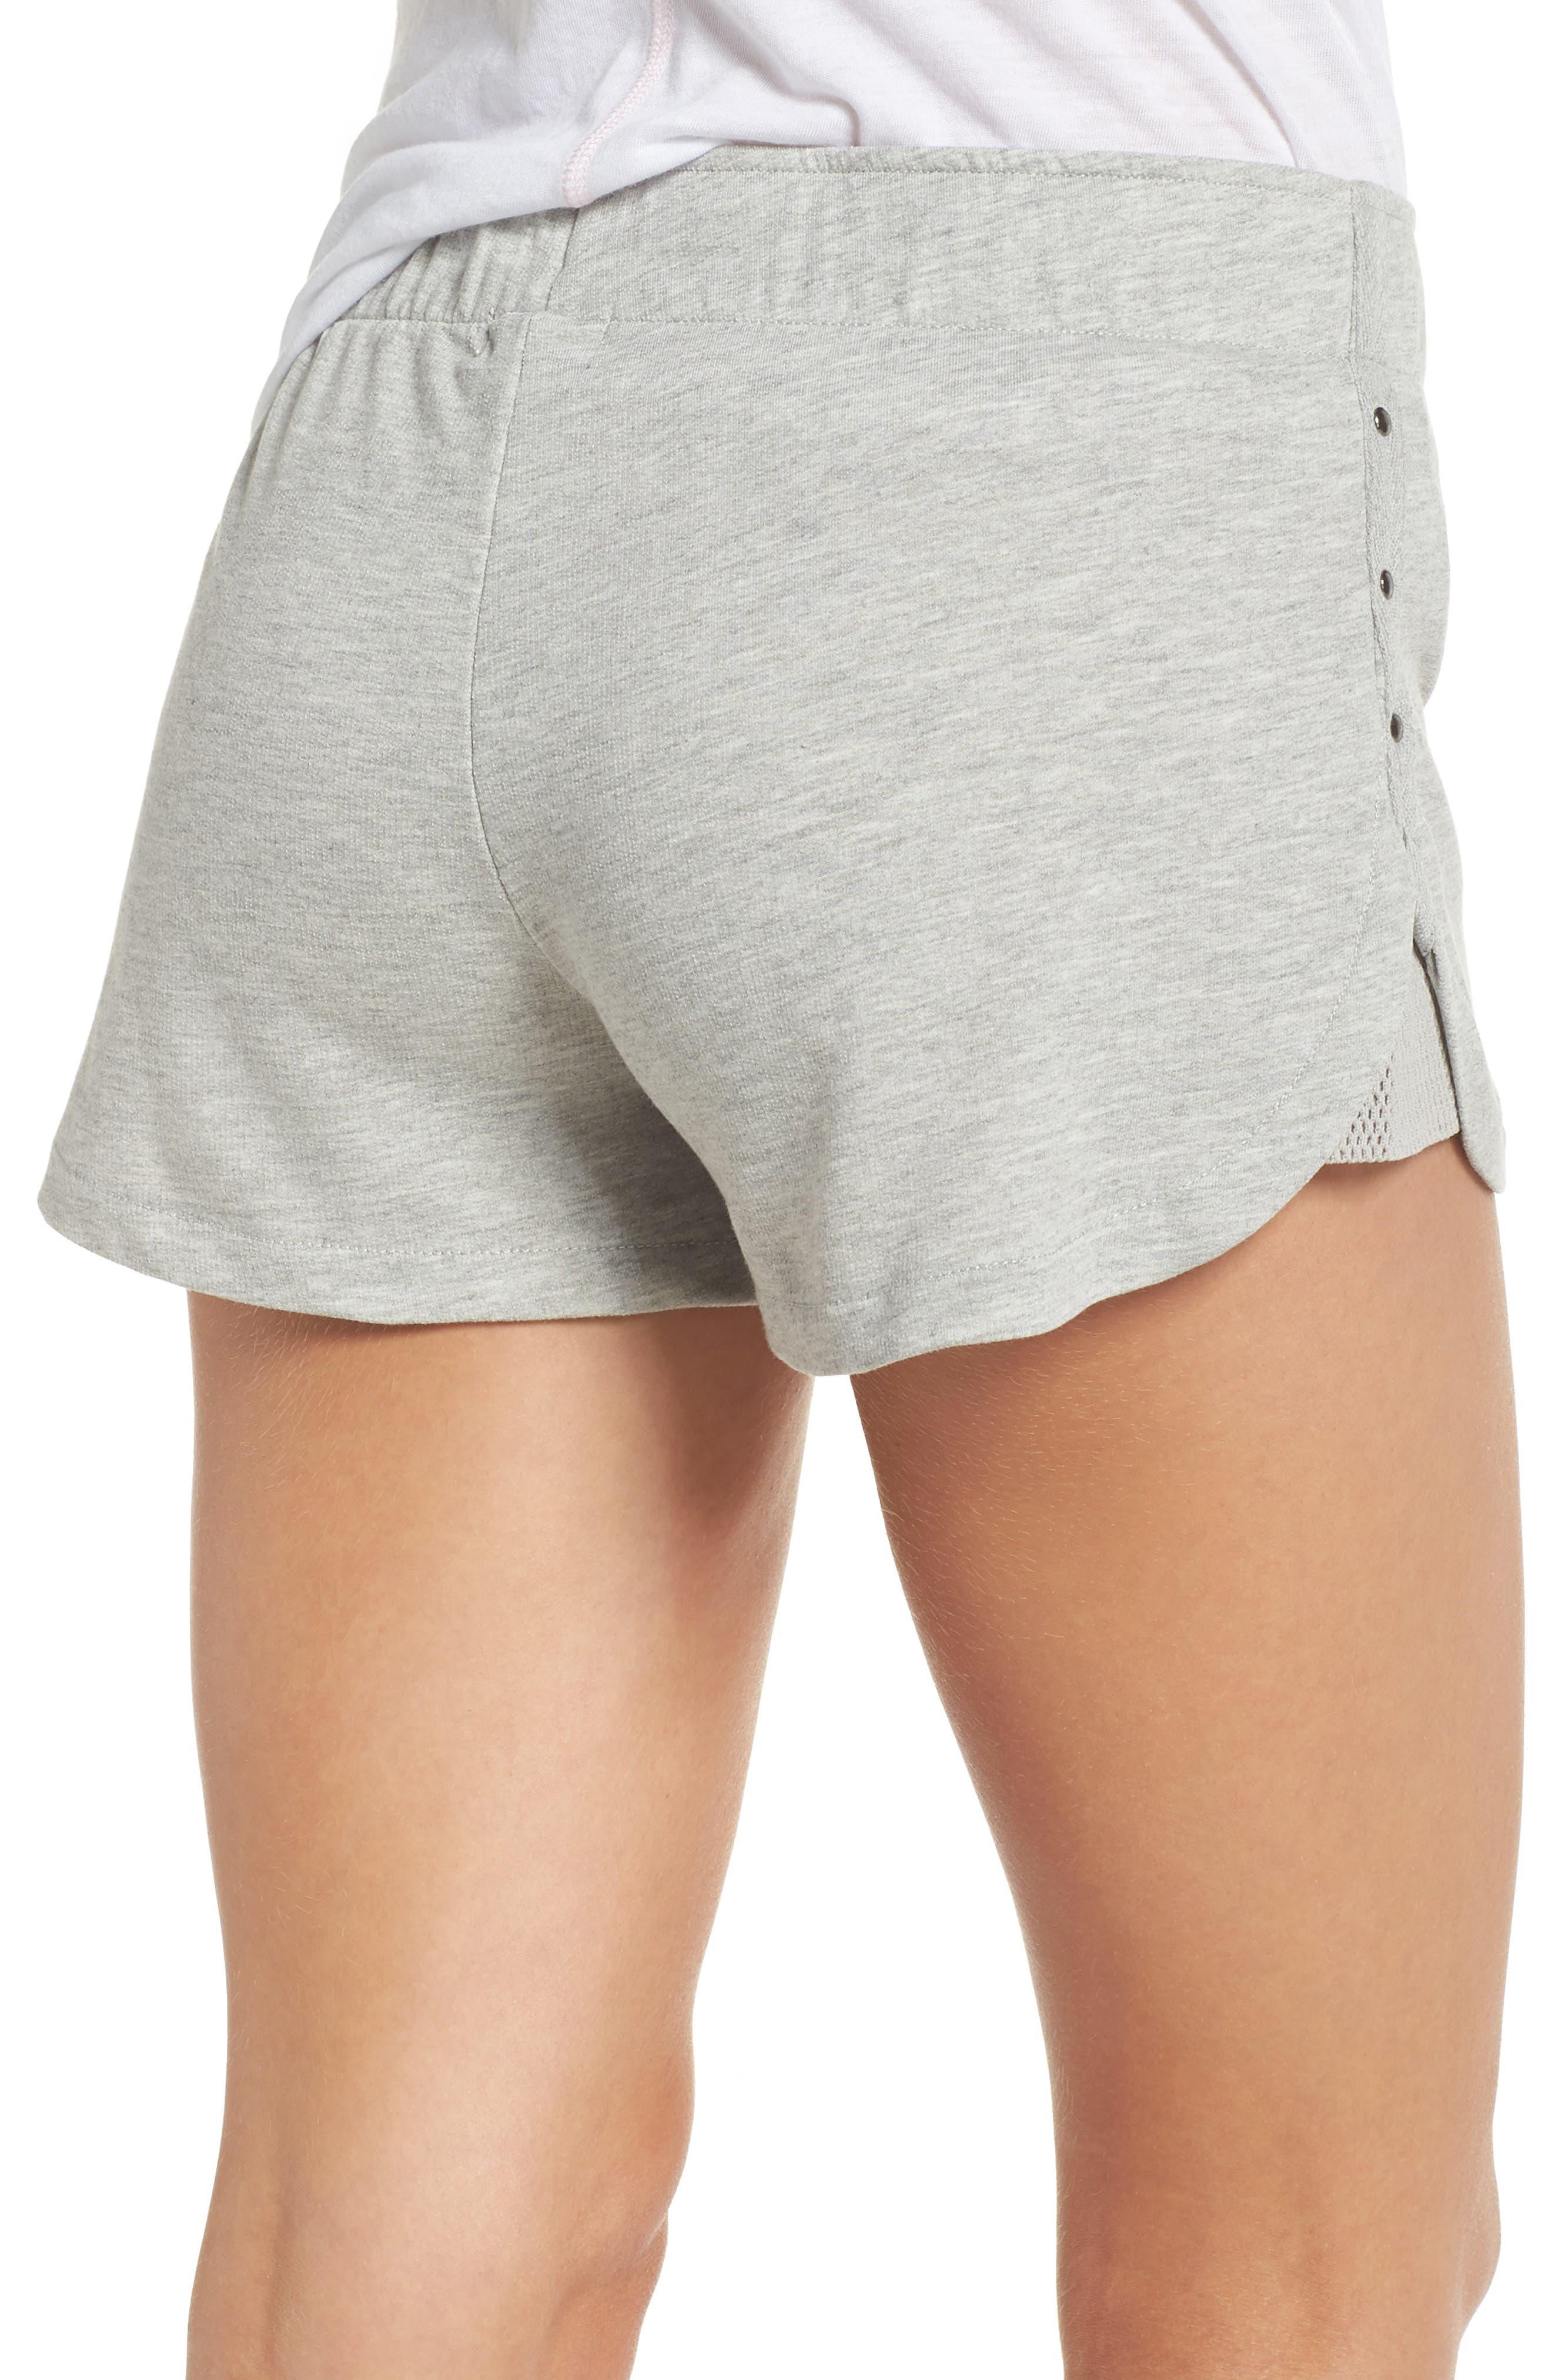 Pajama Shorts,                             Alternate thumbnail 2, color,                             020